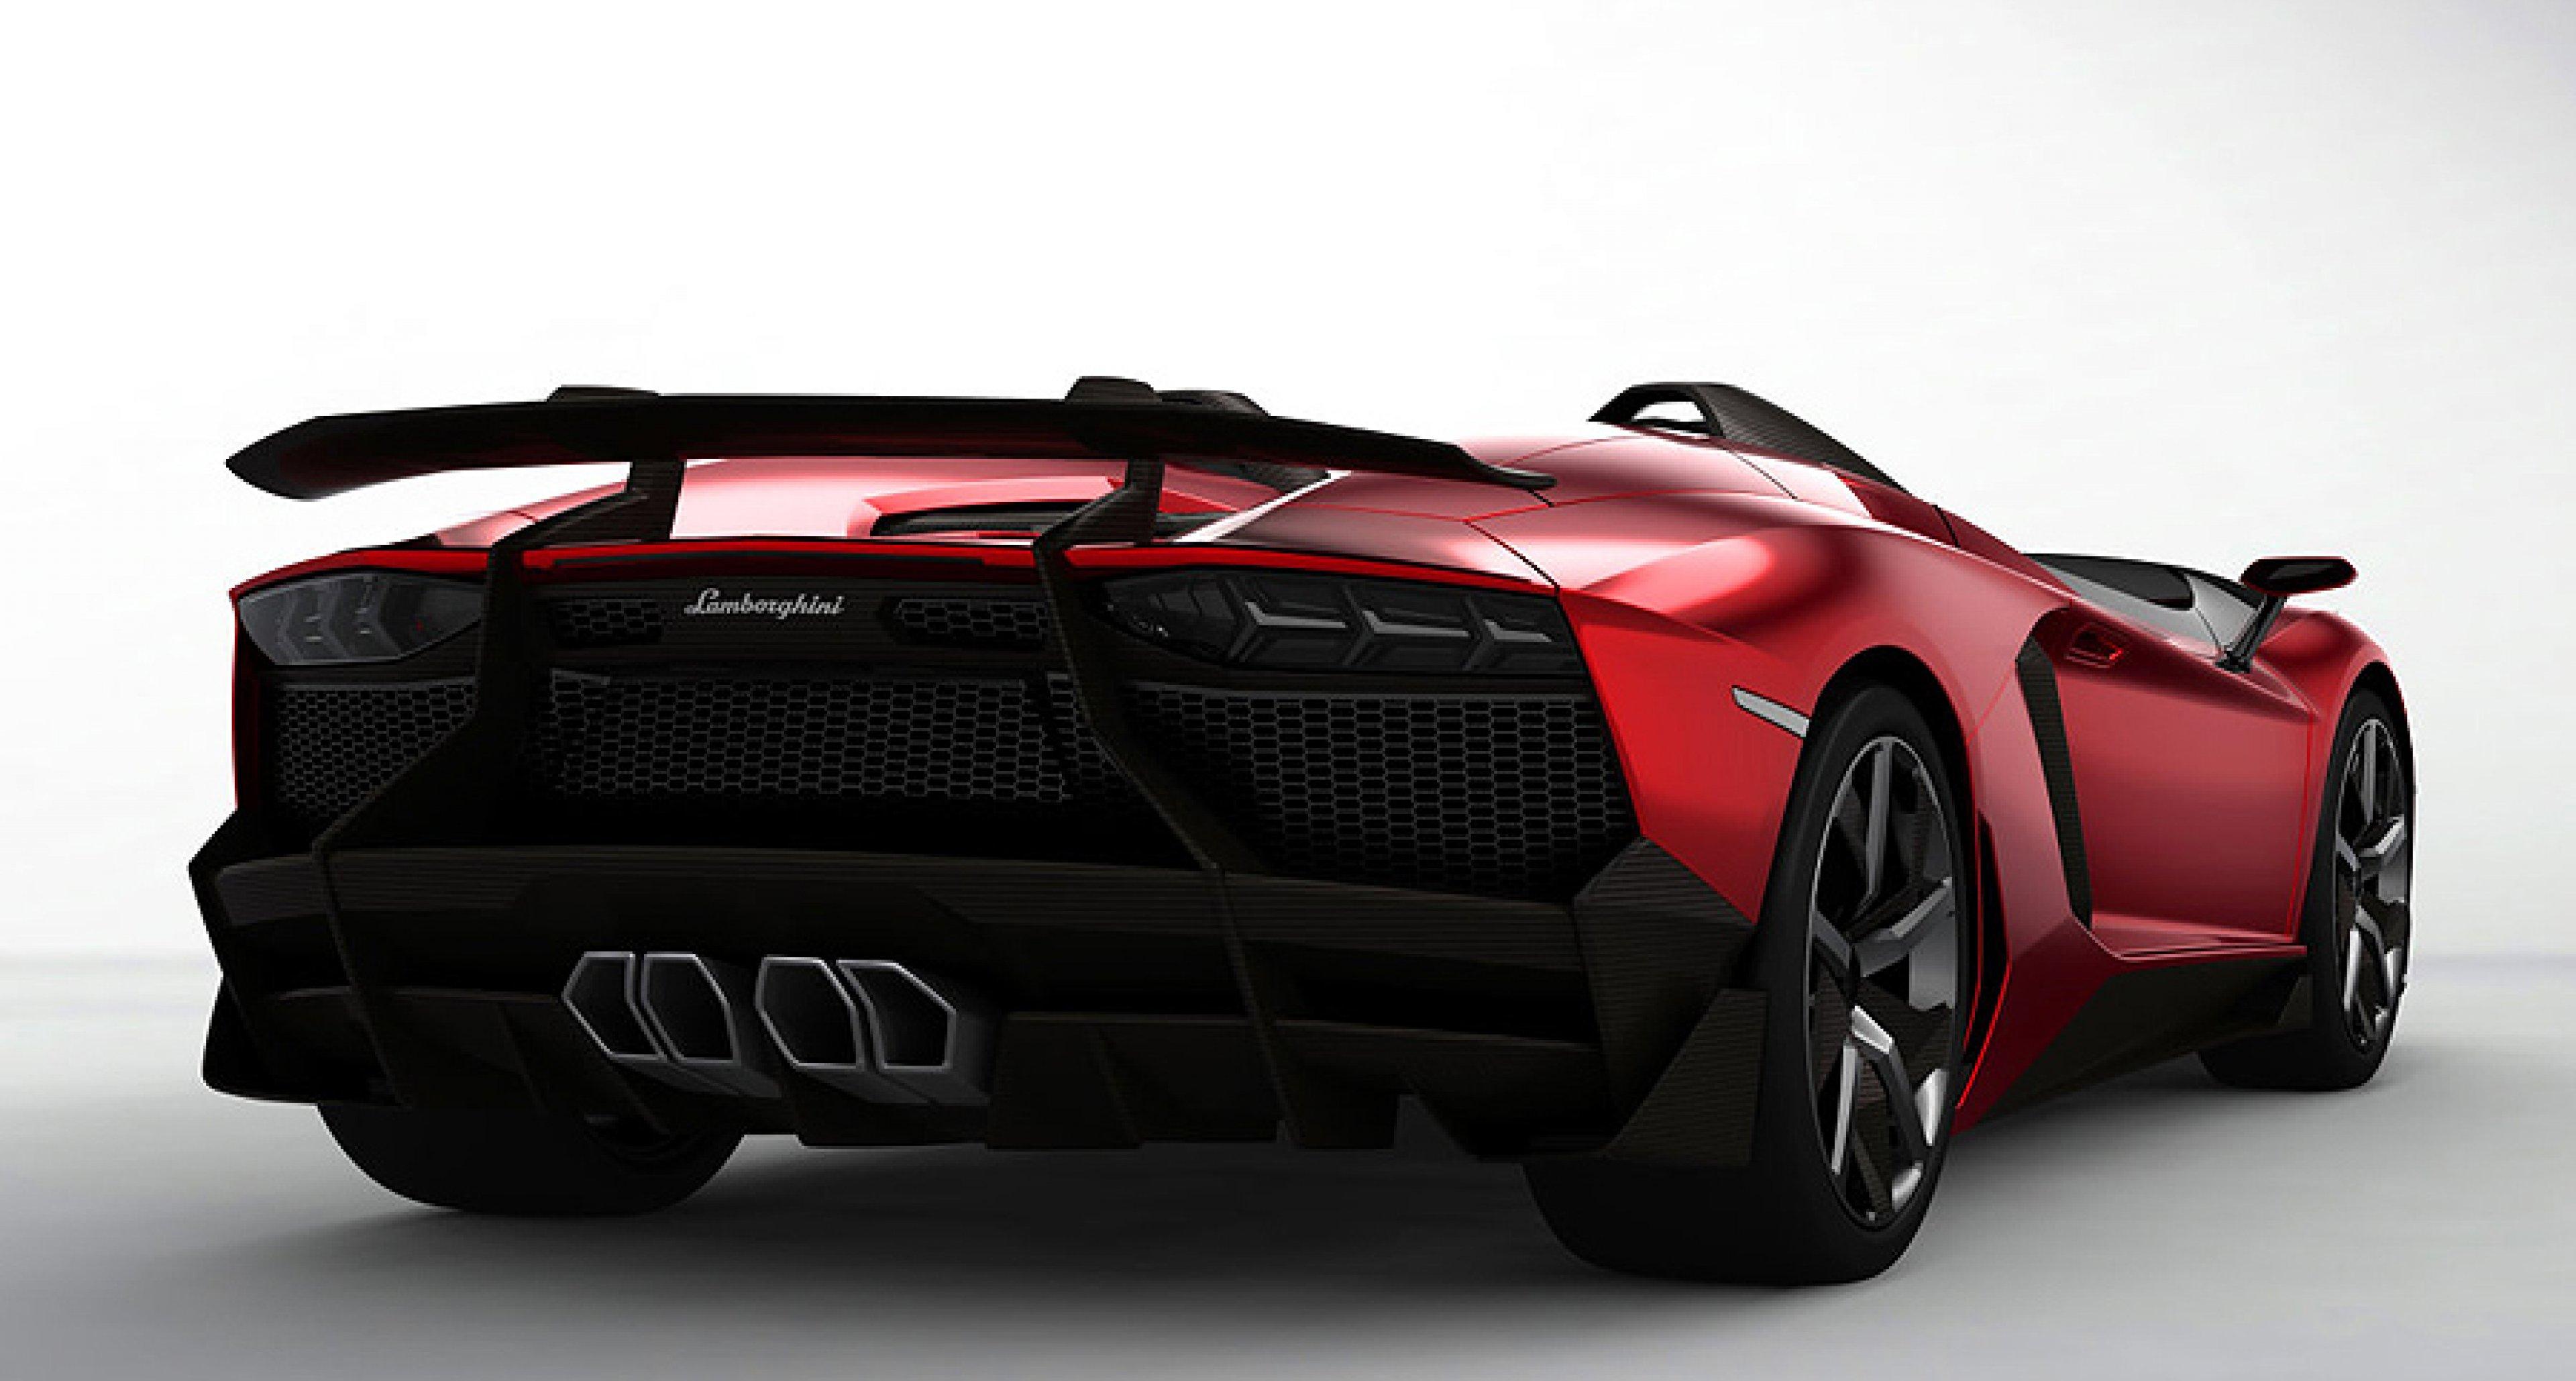 Lamborghini Aventador J: Keine Kompromisse